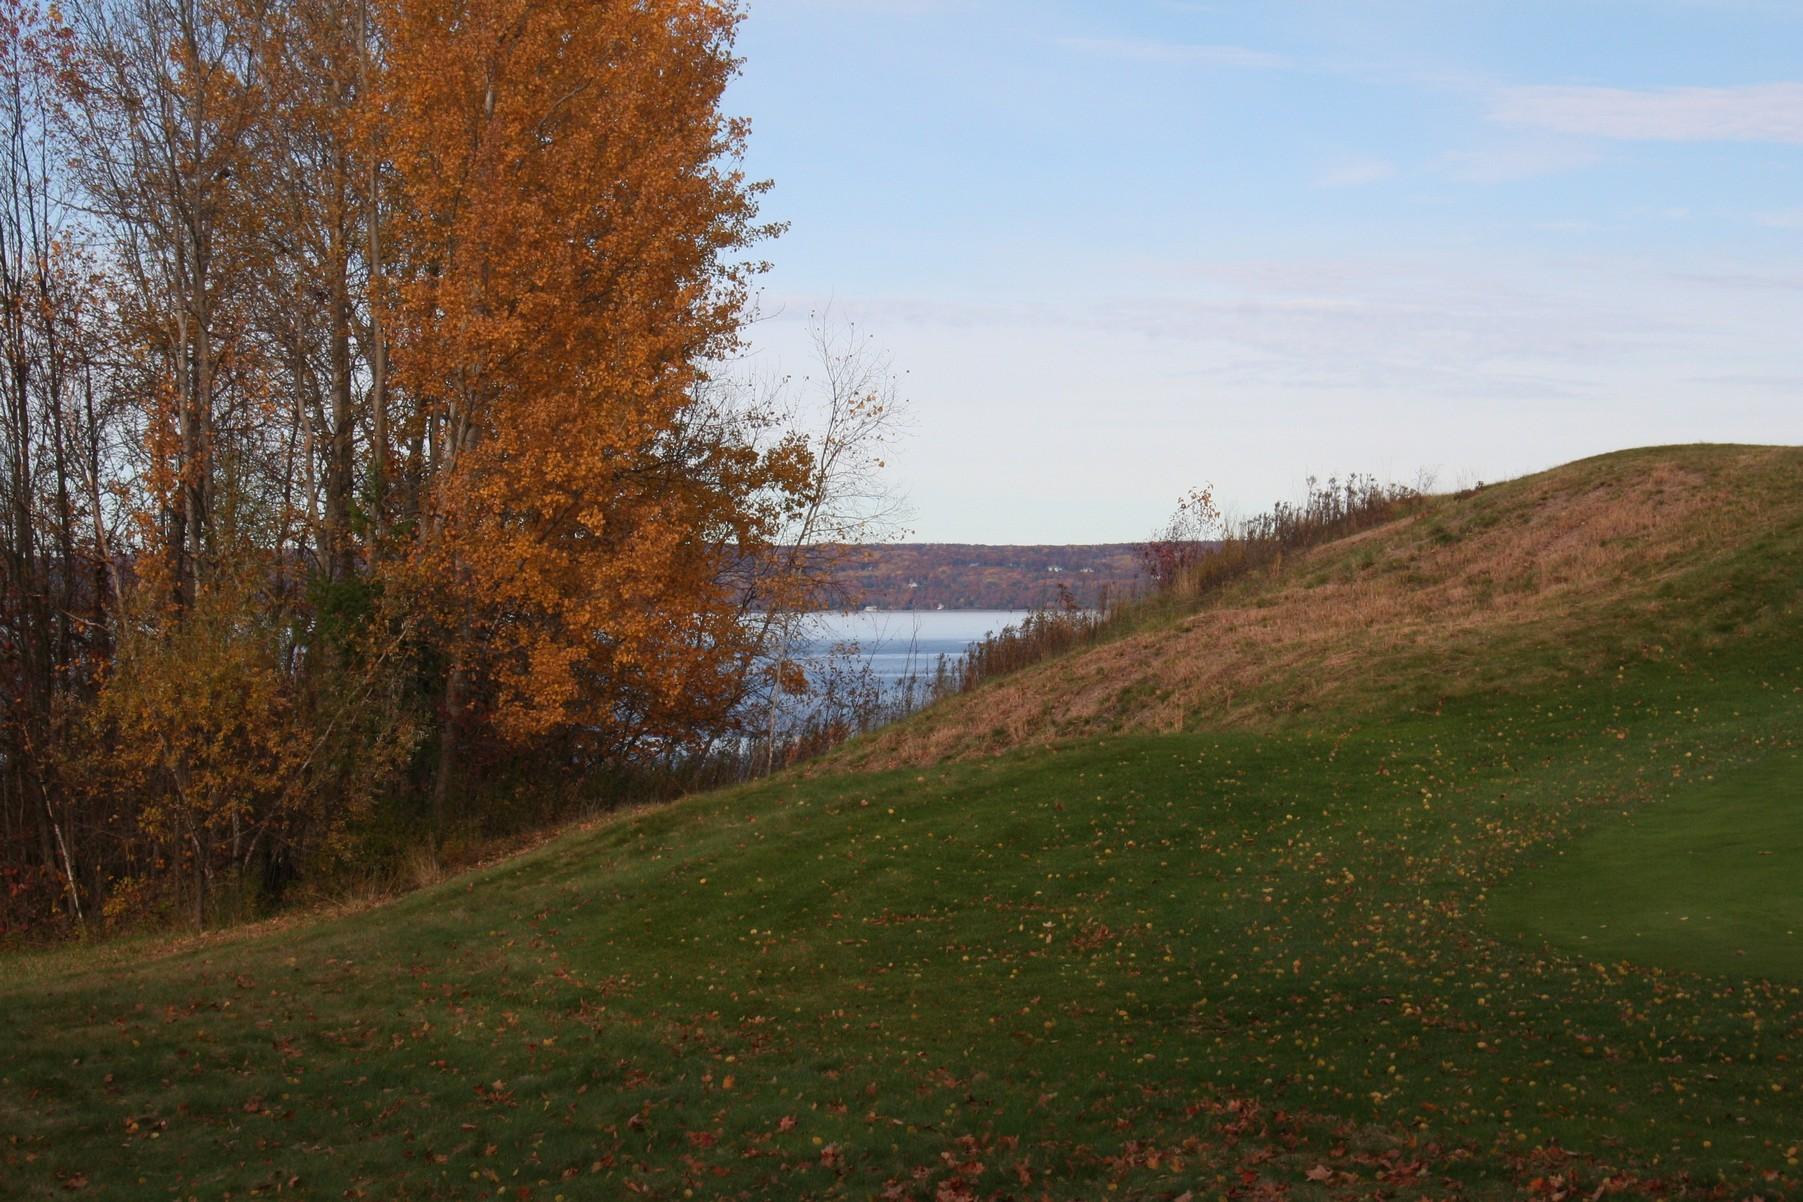 Land for Sale at Coastal Woods 33 5694 Coastal Woods Court Bay Harbor, Michigan, 49770 United States